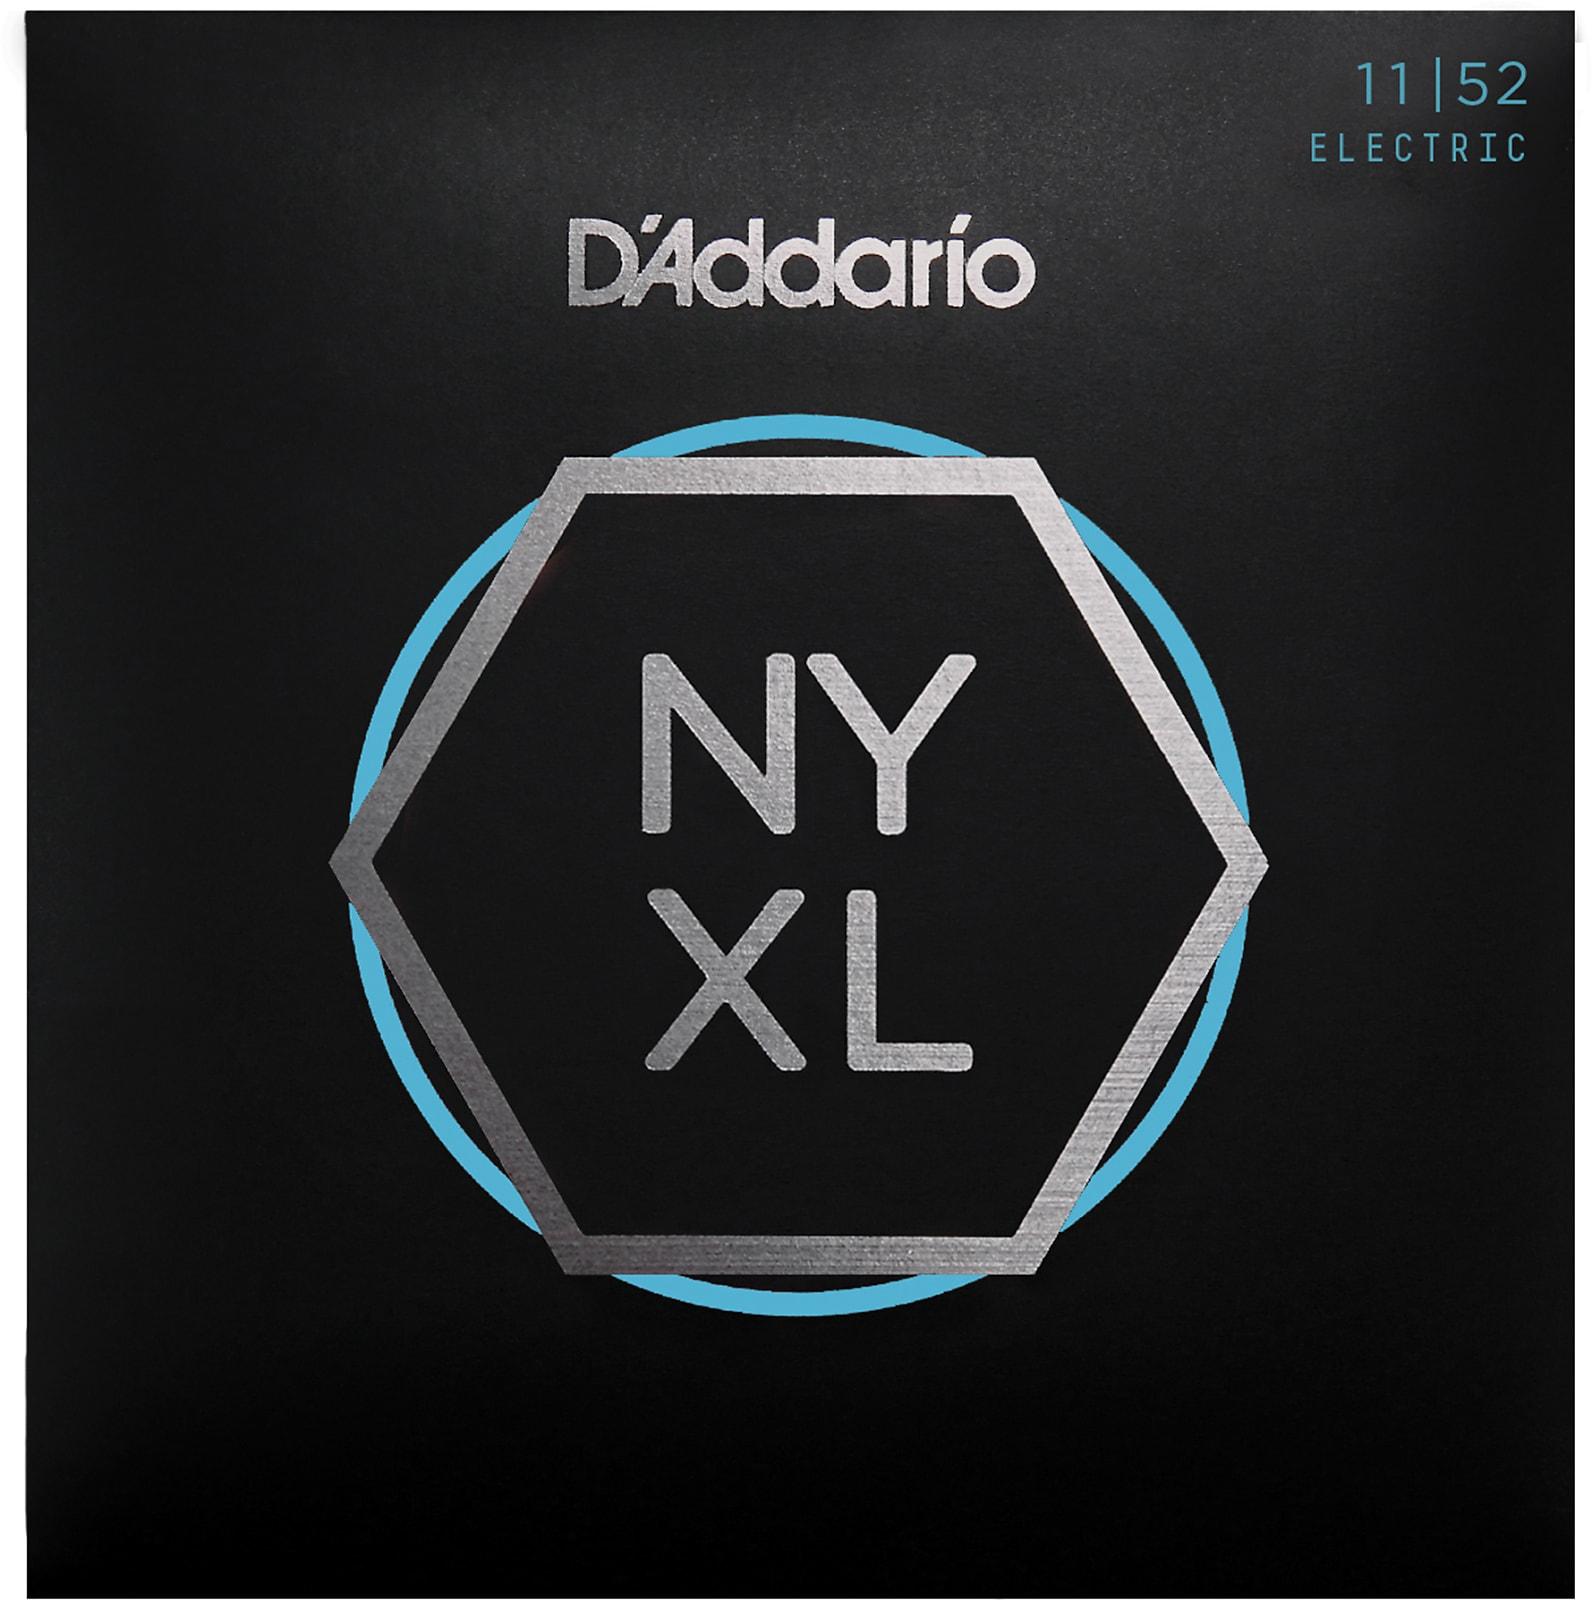 D'Addario NYXL1152 Nickel Wound Electric Guitar Strings, Medium Top / Heavy Bot